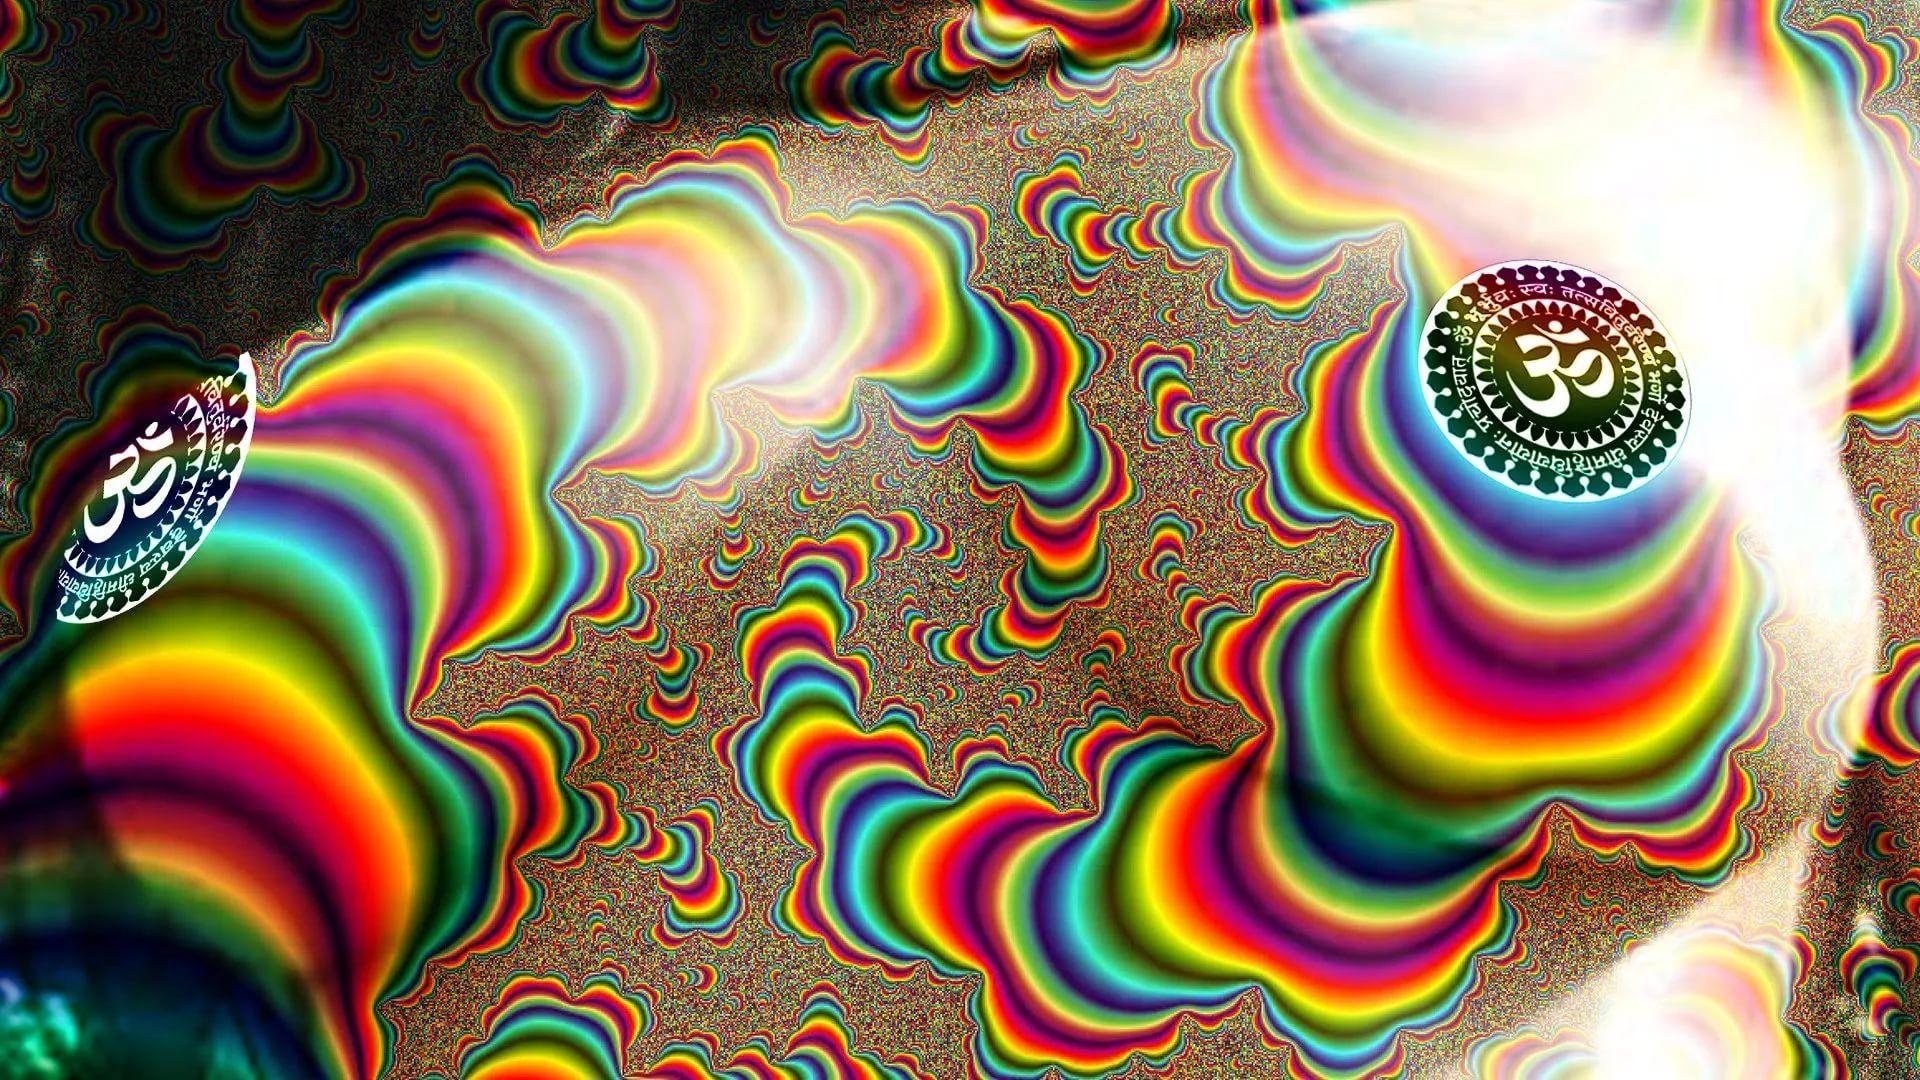 Trippy Rasta desktop wallpaper